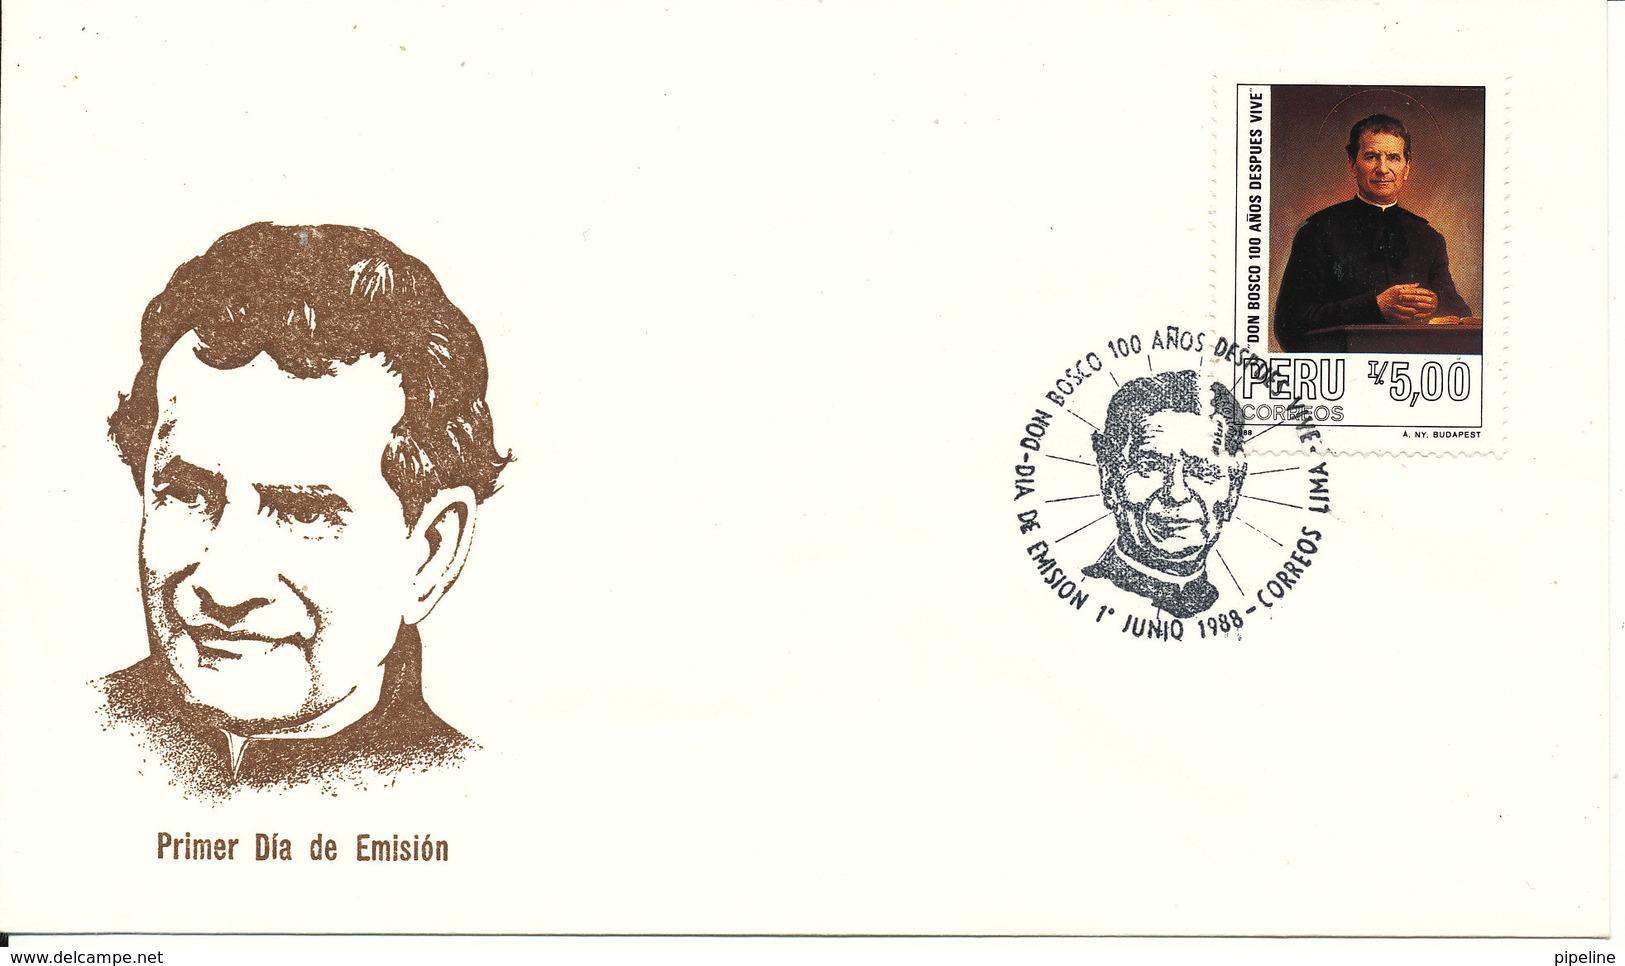 Peru FDC 1-6-1988 San Juan Bosco With Cachet - Peru